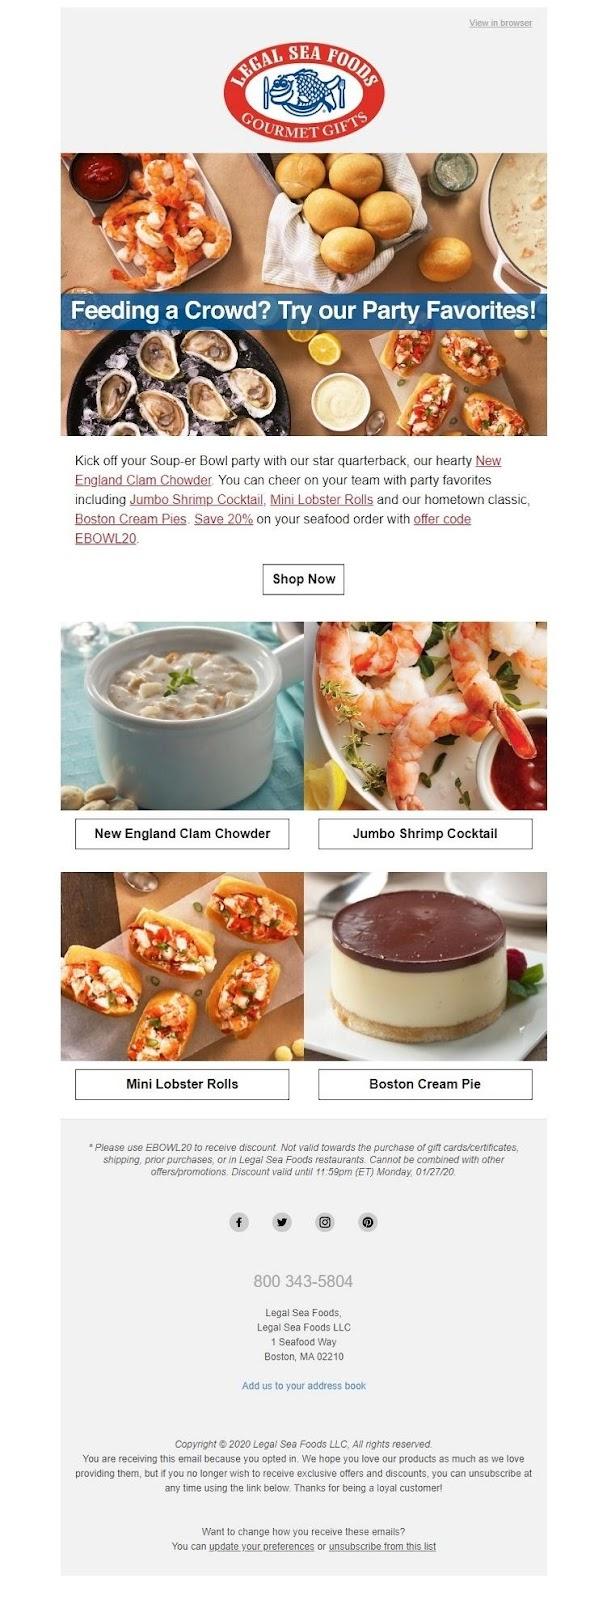 Legal Sea Foods newsletter